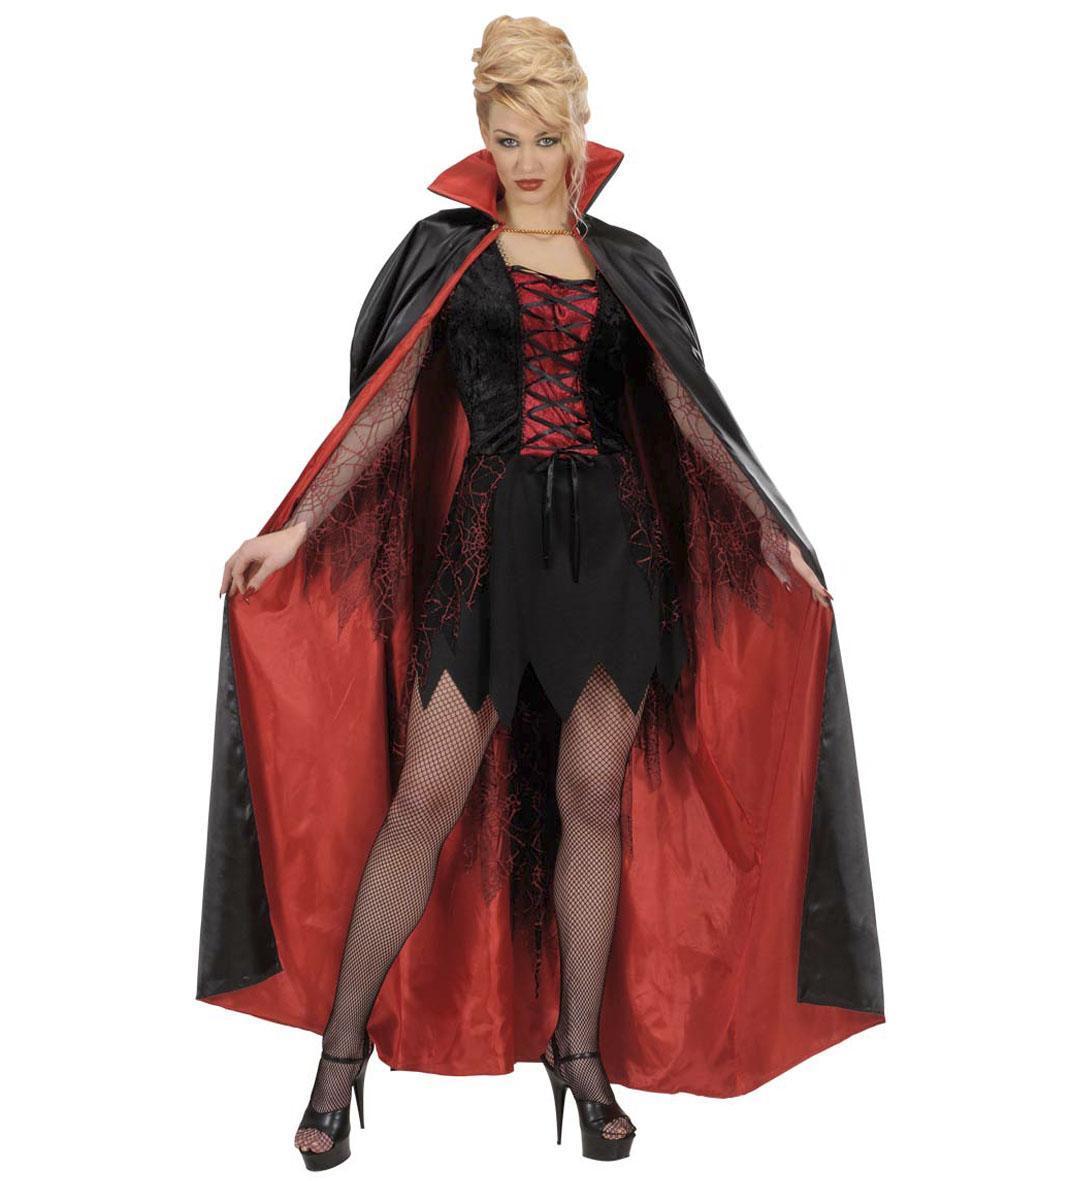 Karneval Halloween Uni Cape schwarz rot 7150B a